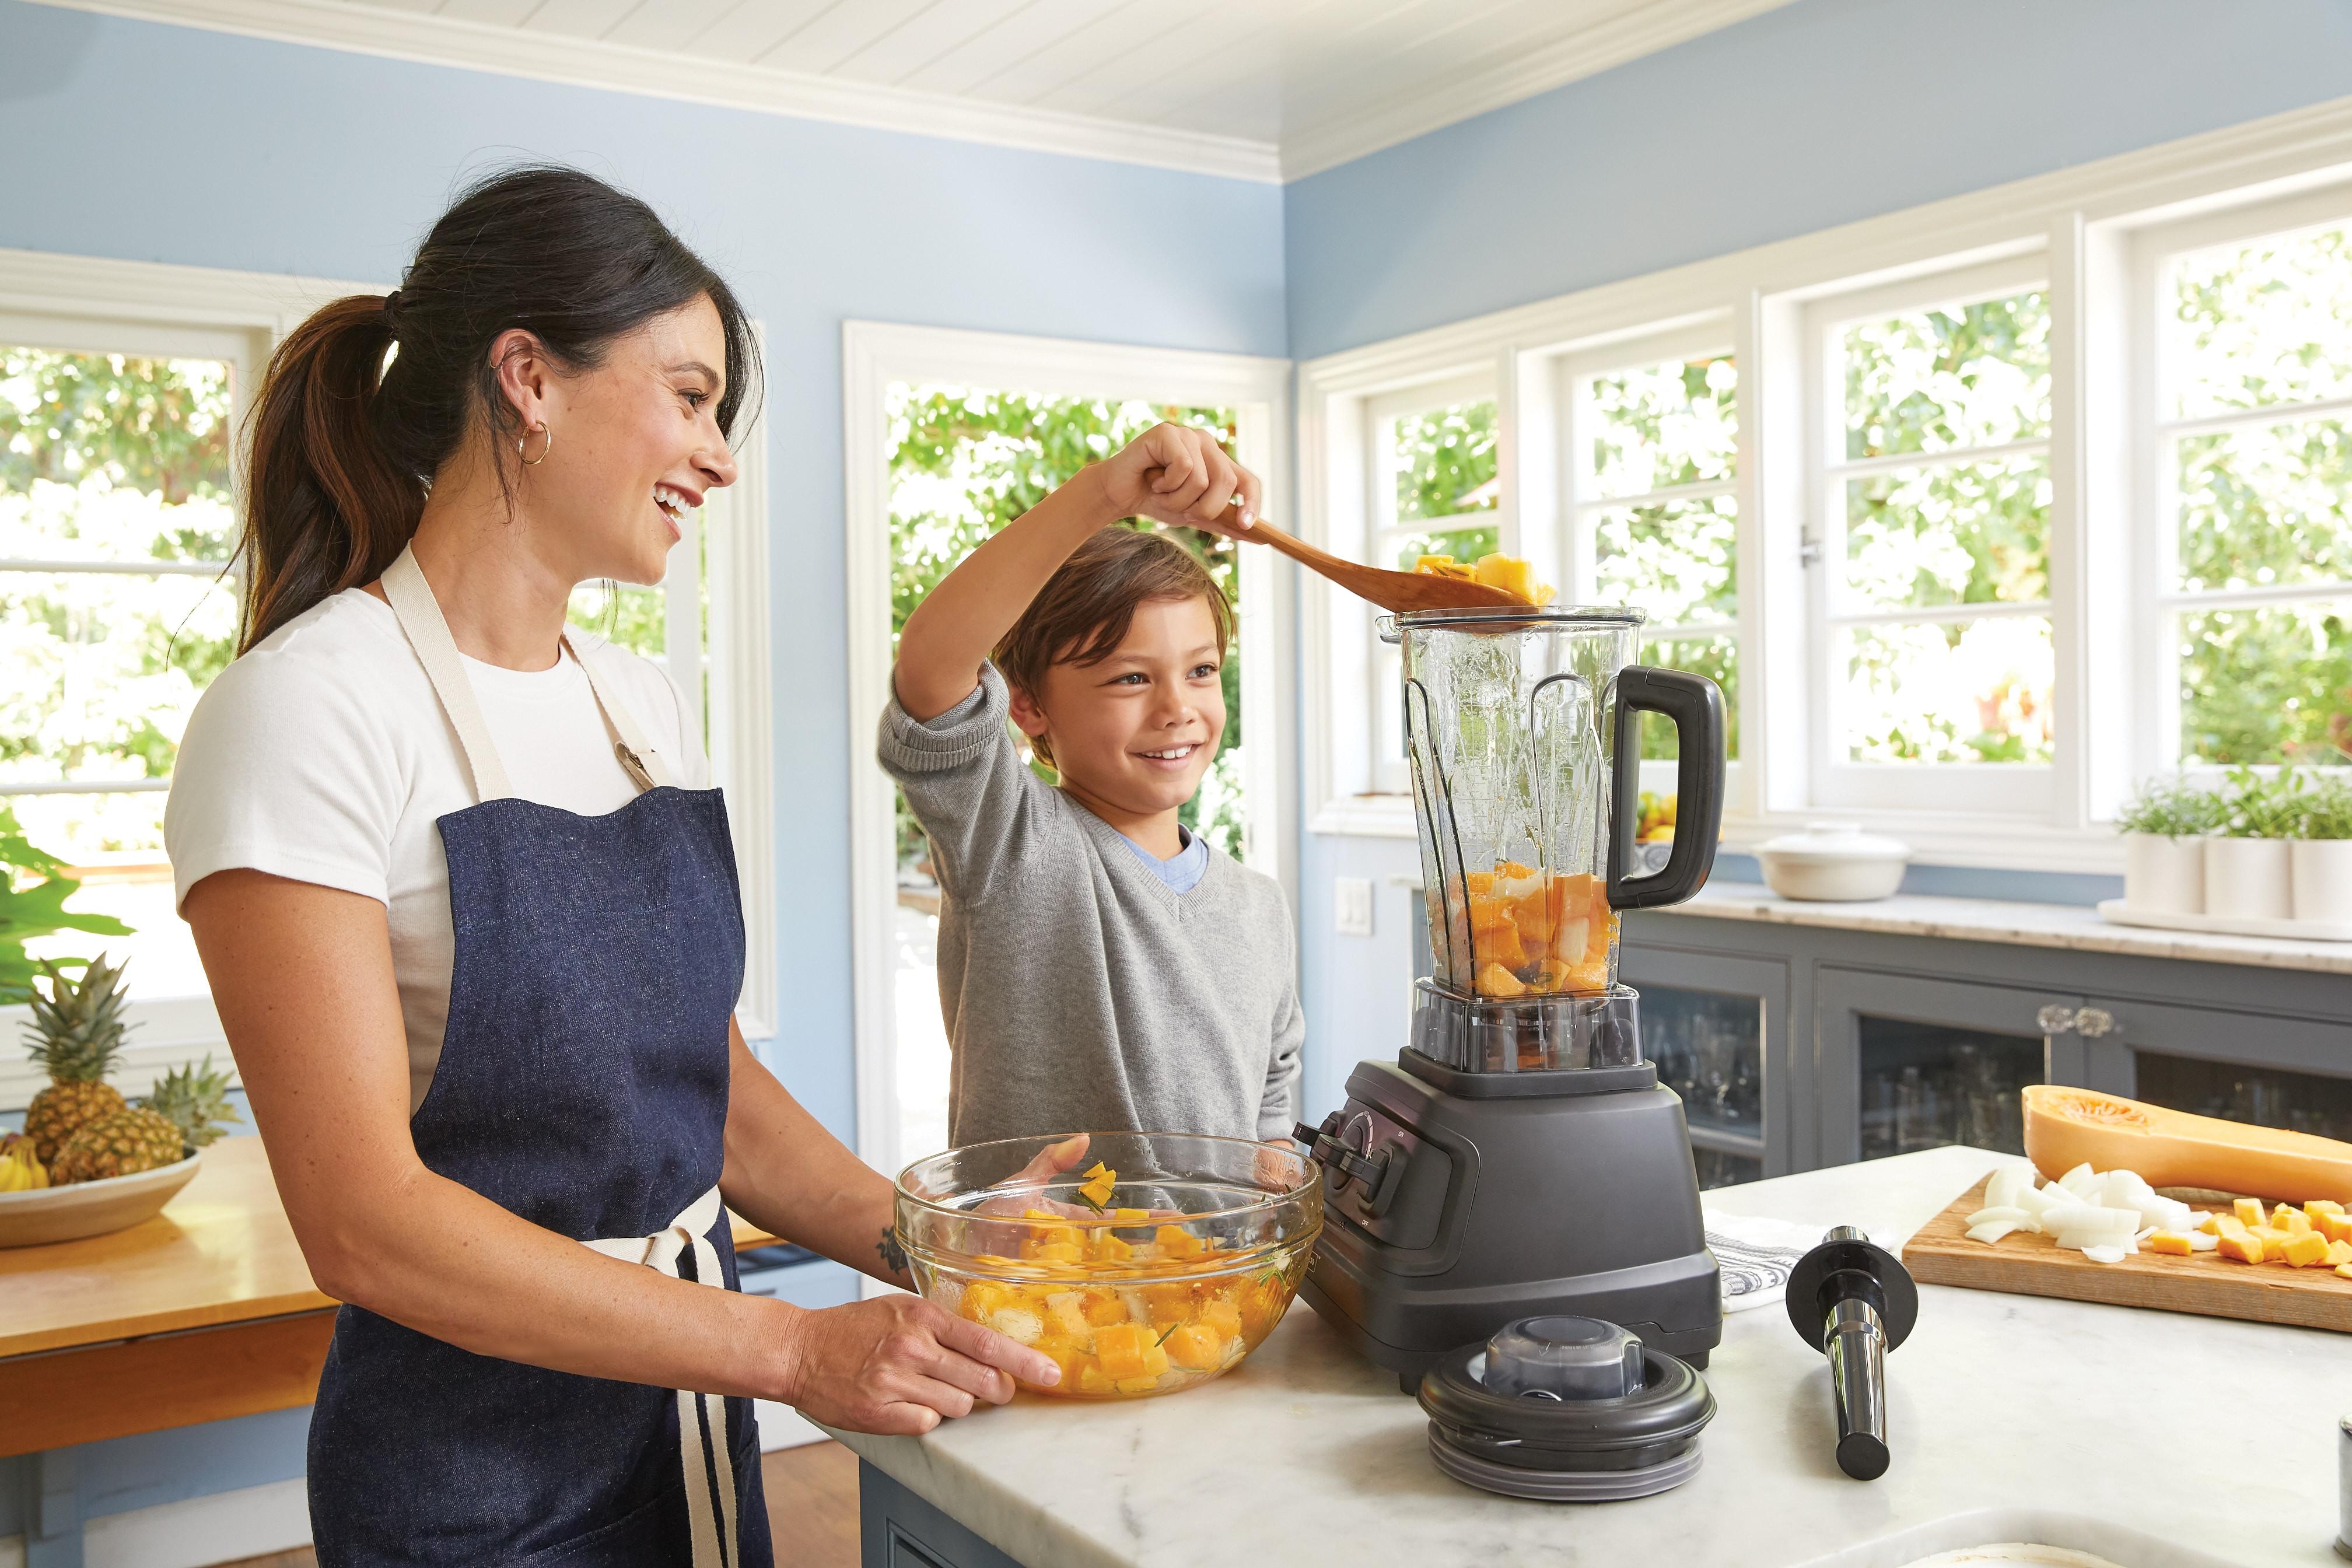 Family Nutrition Follow-Up